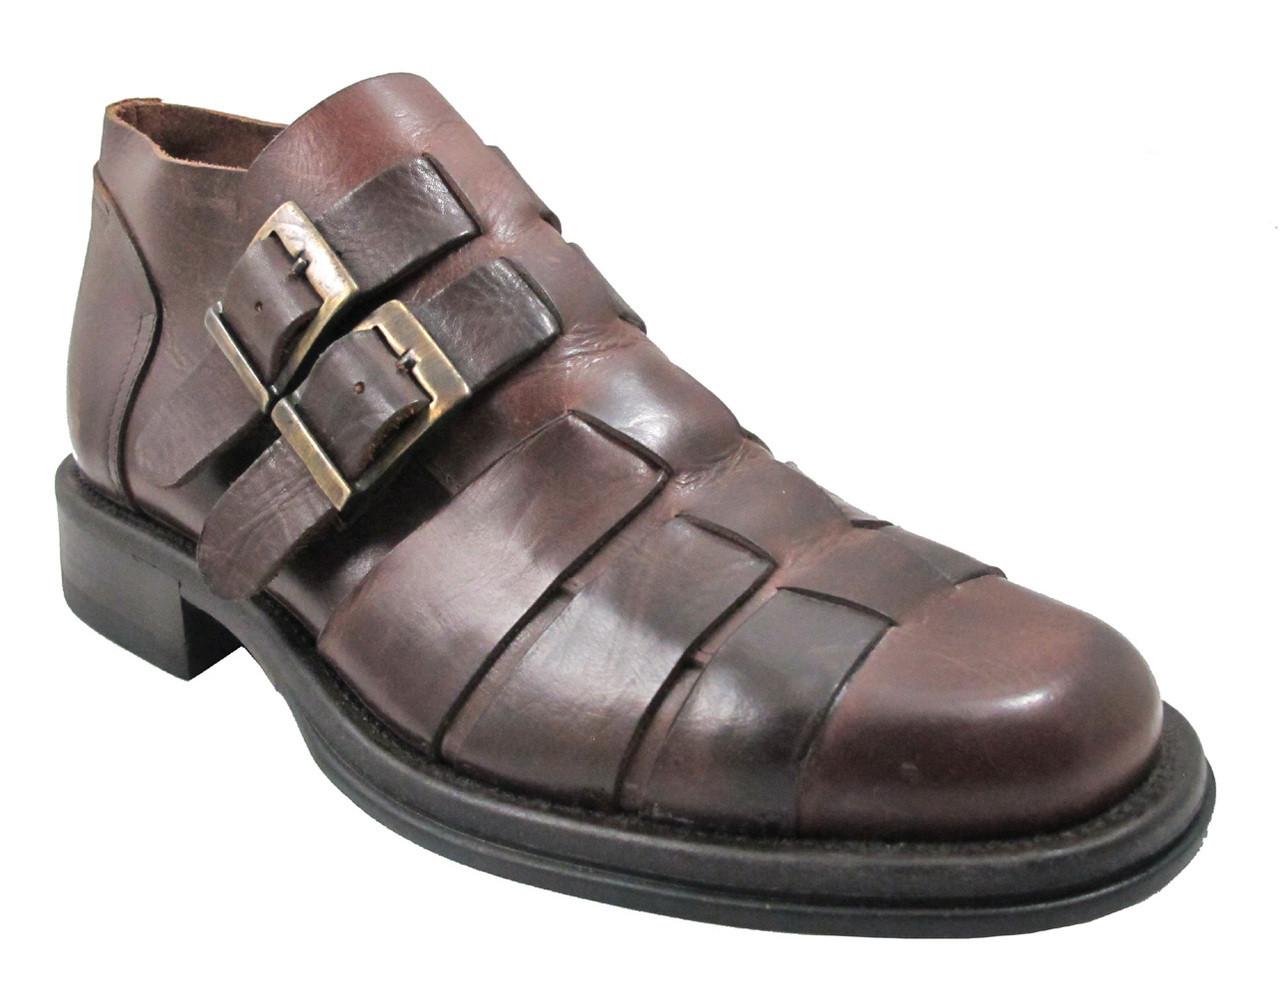 Davinci Men's 4723 Italian Double Buckle Straps Ankle Shoe in Brown